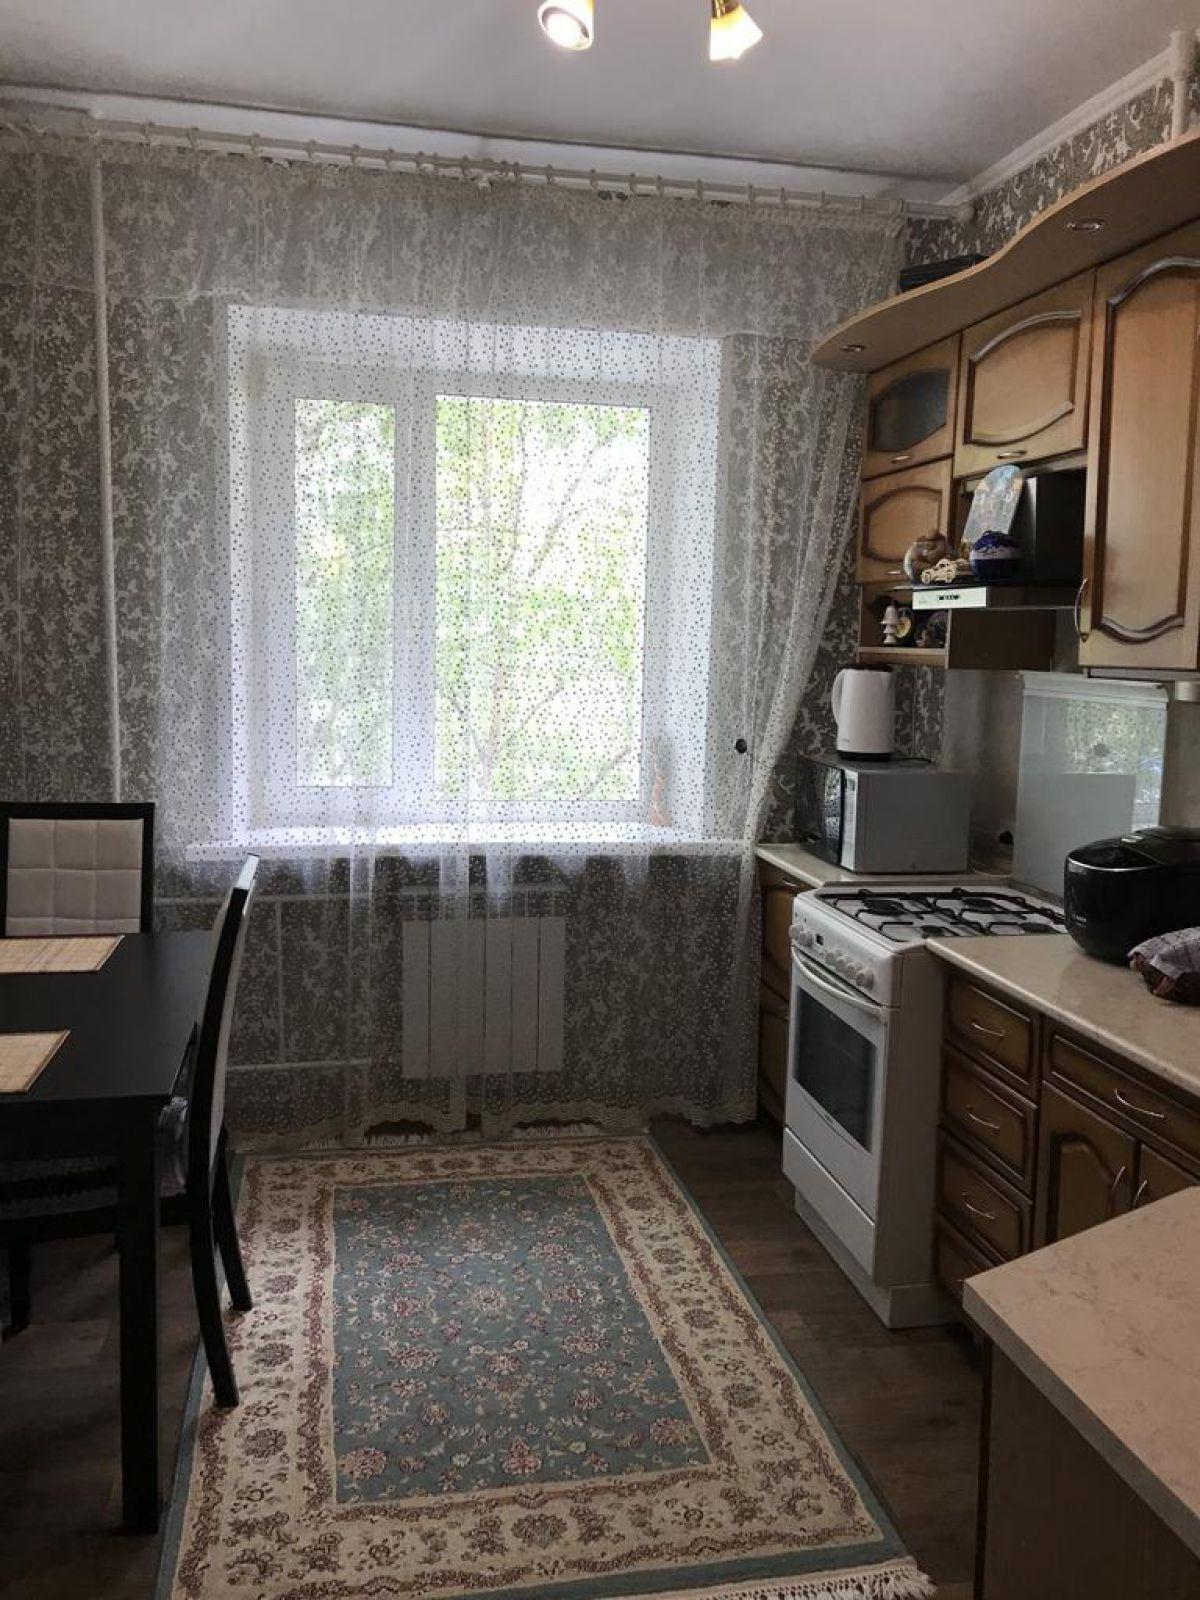 2-комн. , Ханты-Мансийский автономный округ, Сургут, Энтузиастов ул, 51